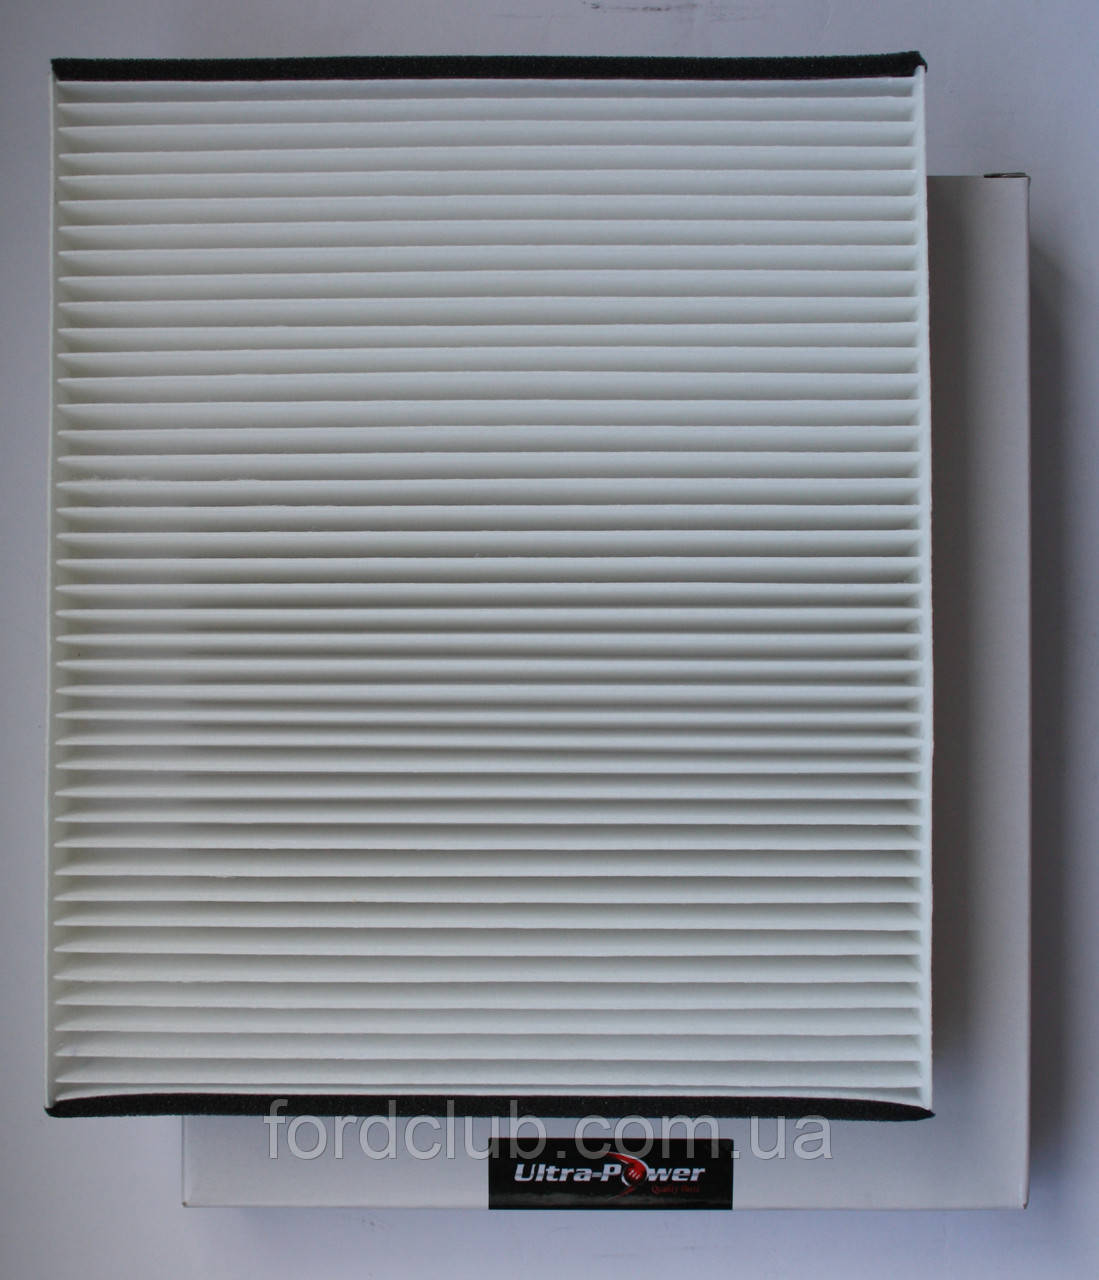 Фильтр салона Ford C-Max USA; ULTRA-POWER